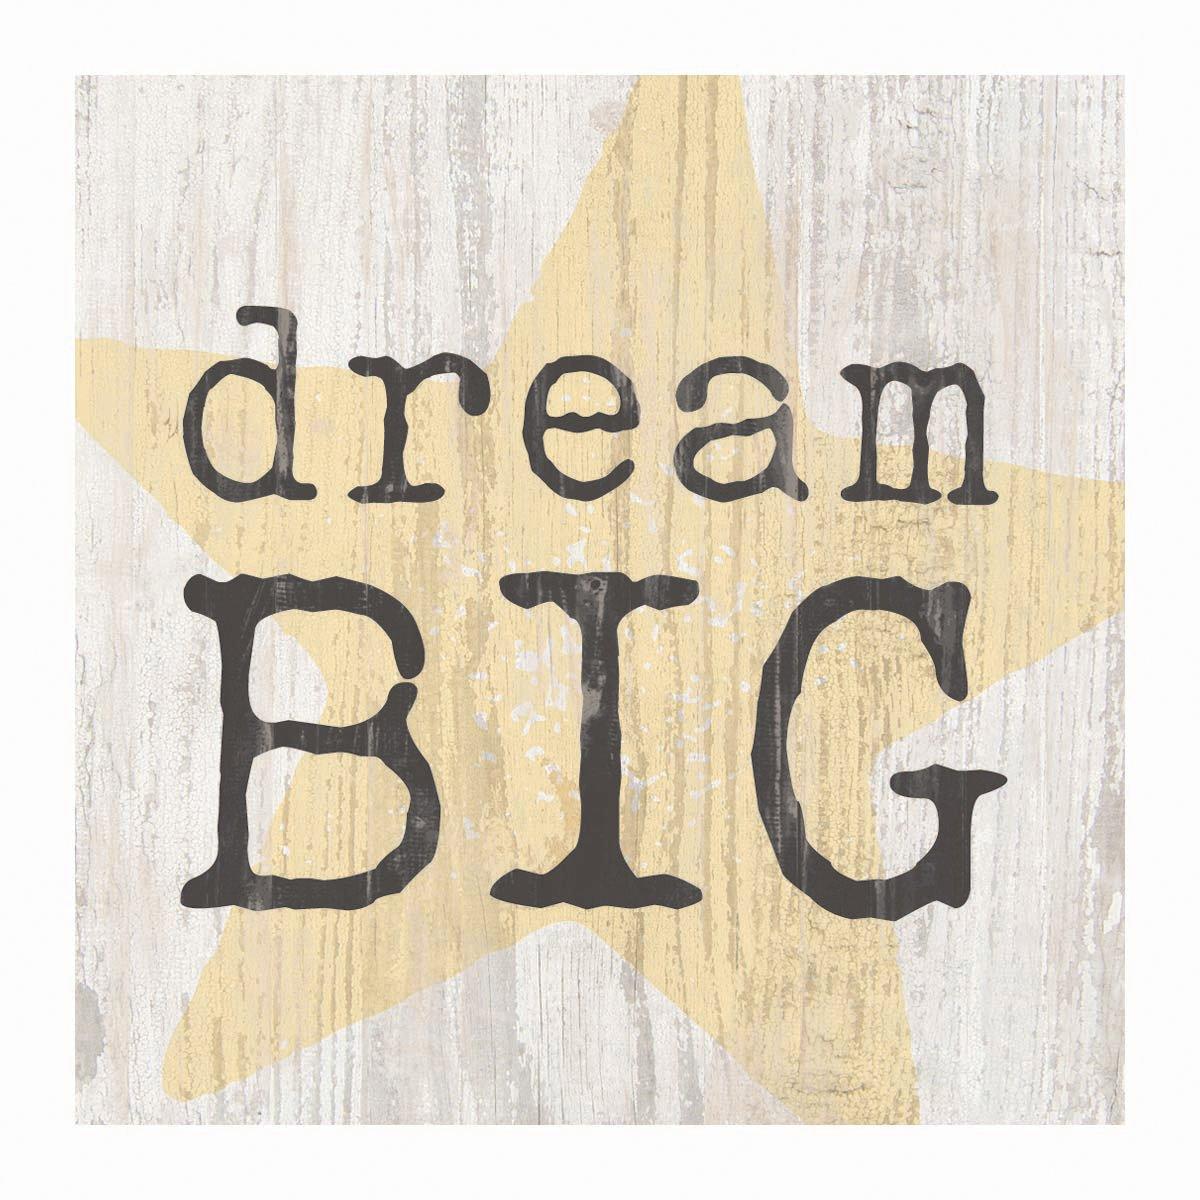 GRAHAM DUNN Dream Big Star Whitewash 3.5 x 3.5 Inch Pine Wood Tabletop Block Sign P